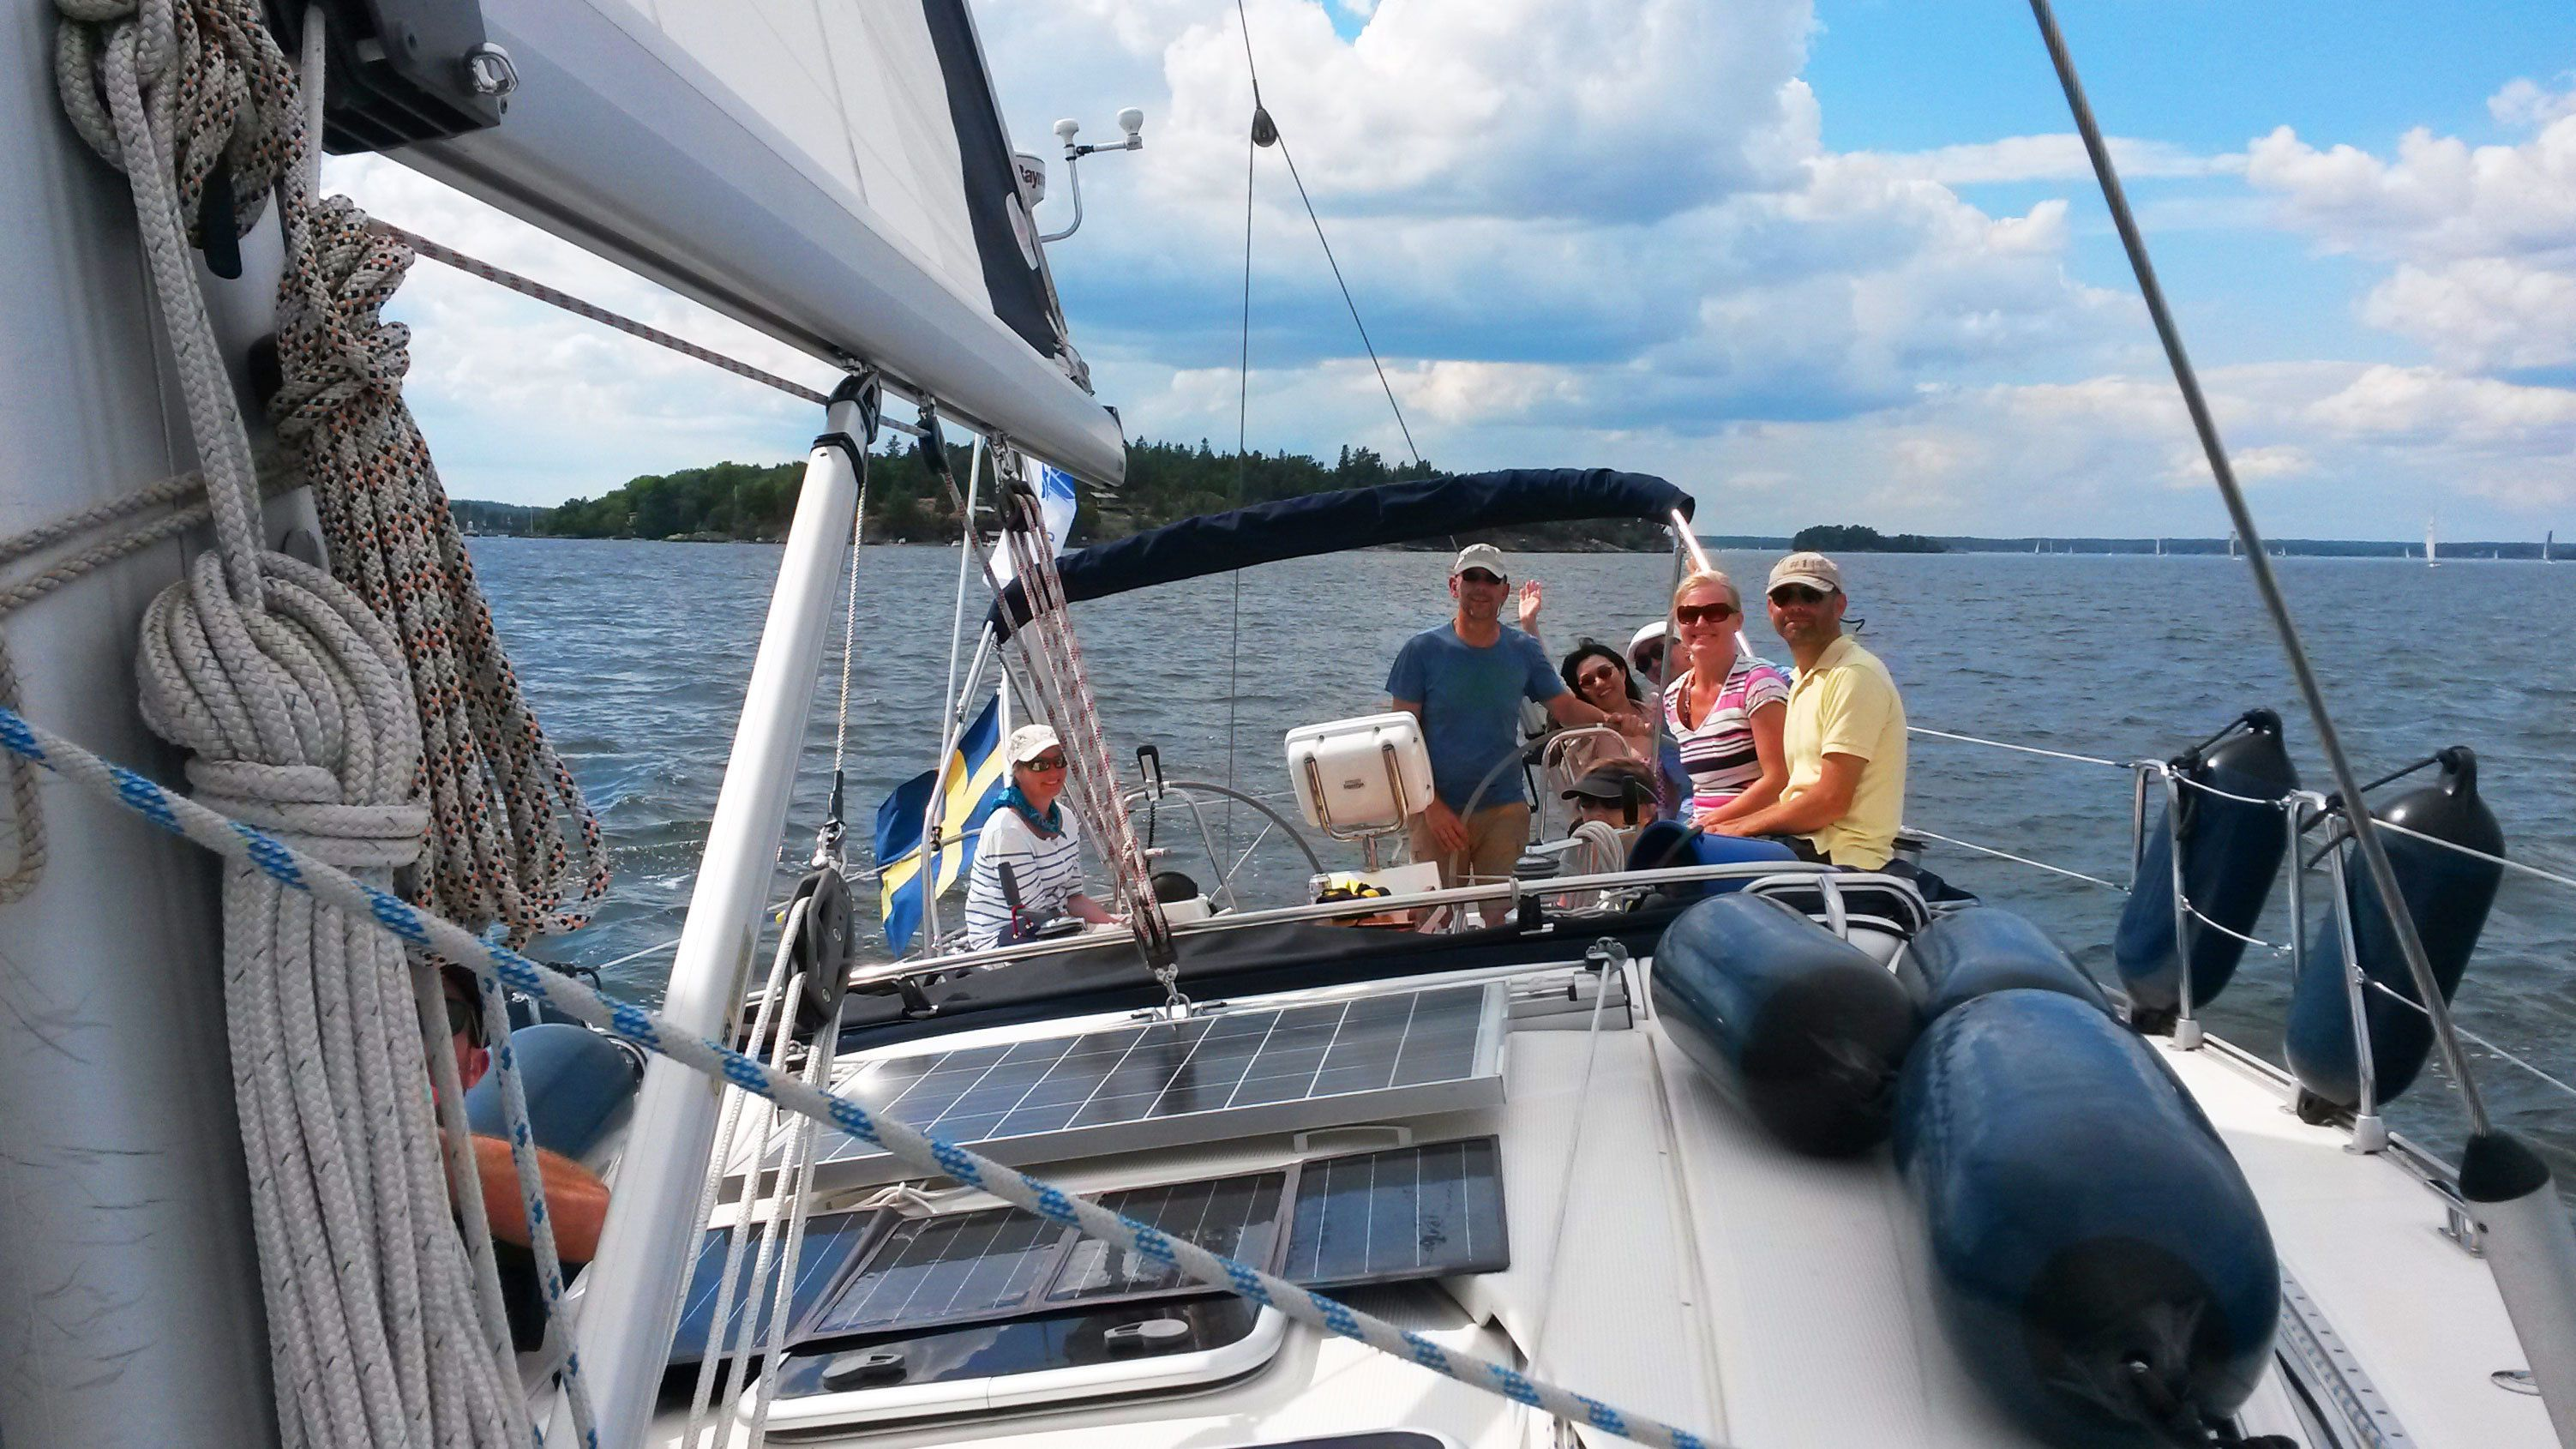 Group sitting at back of sailboat in Stockholm Archipelago